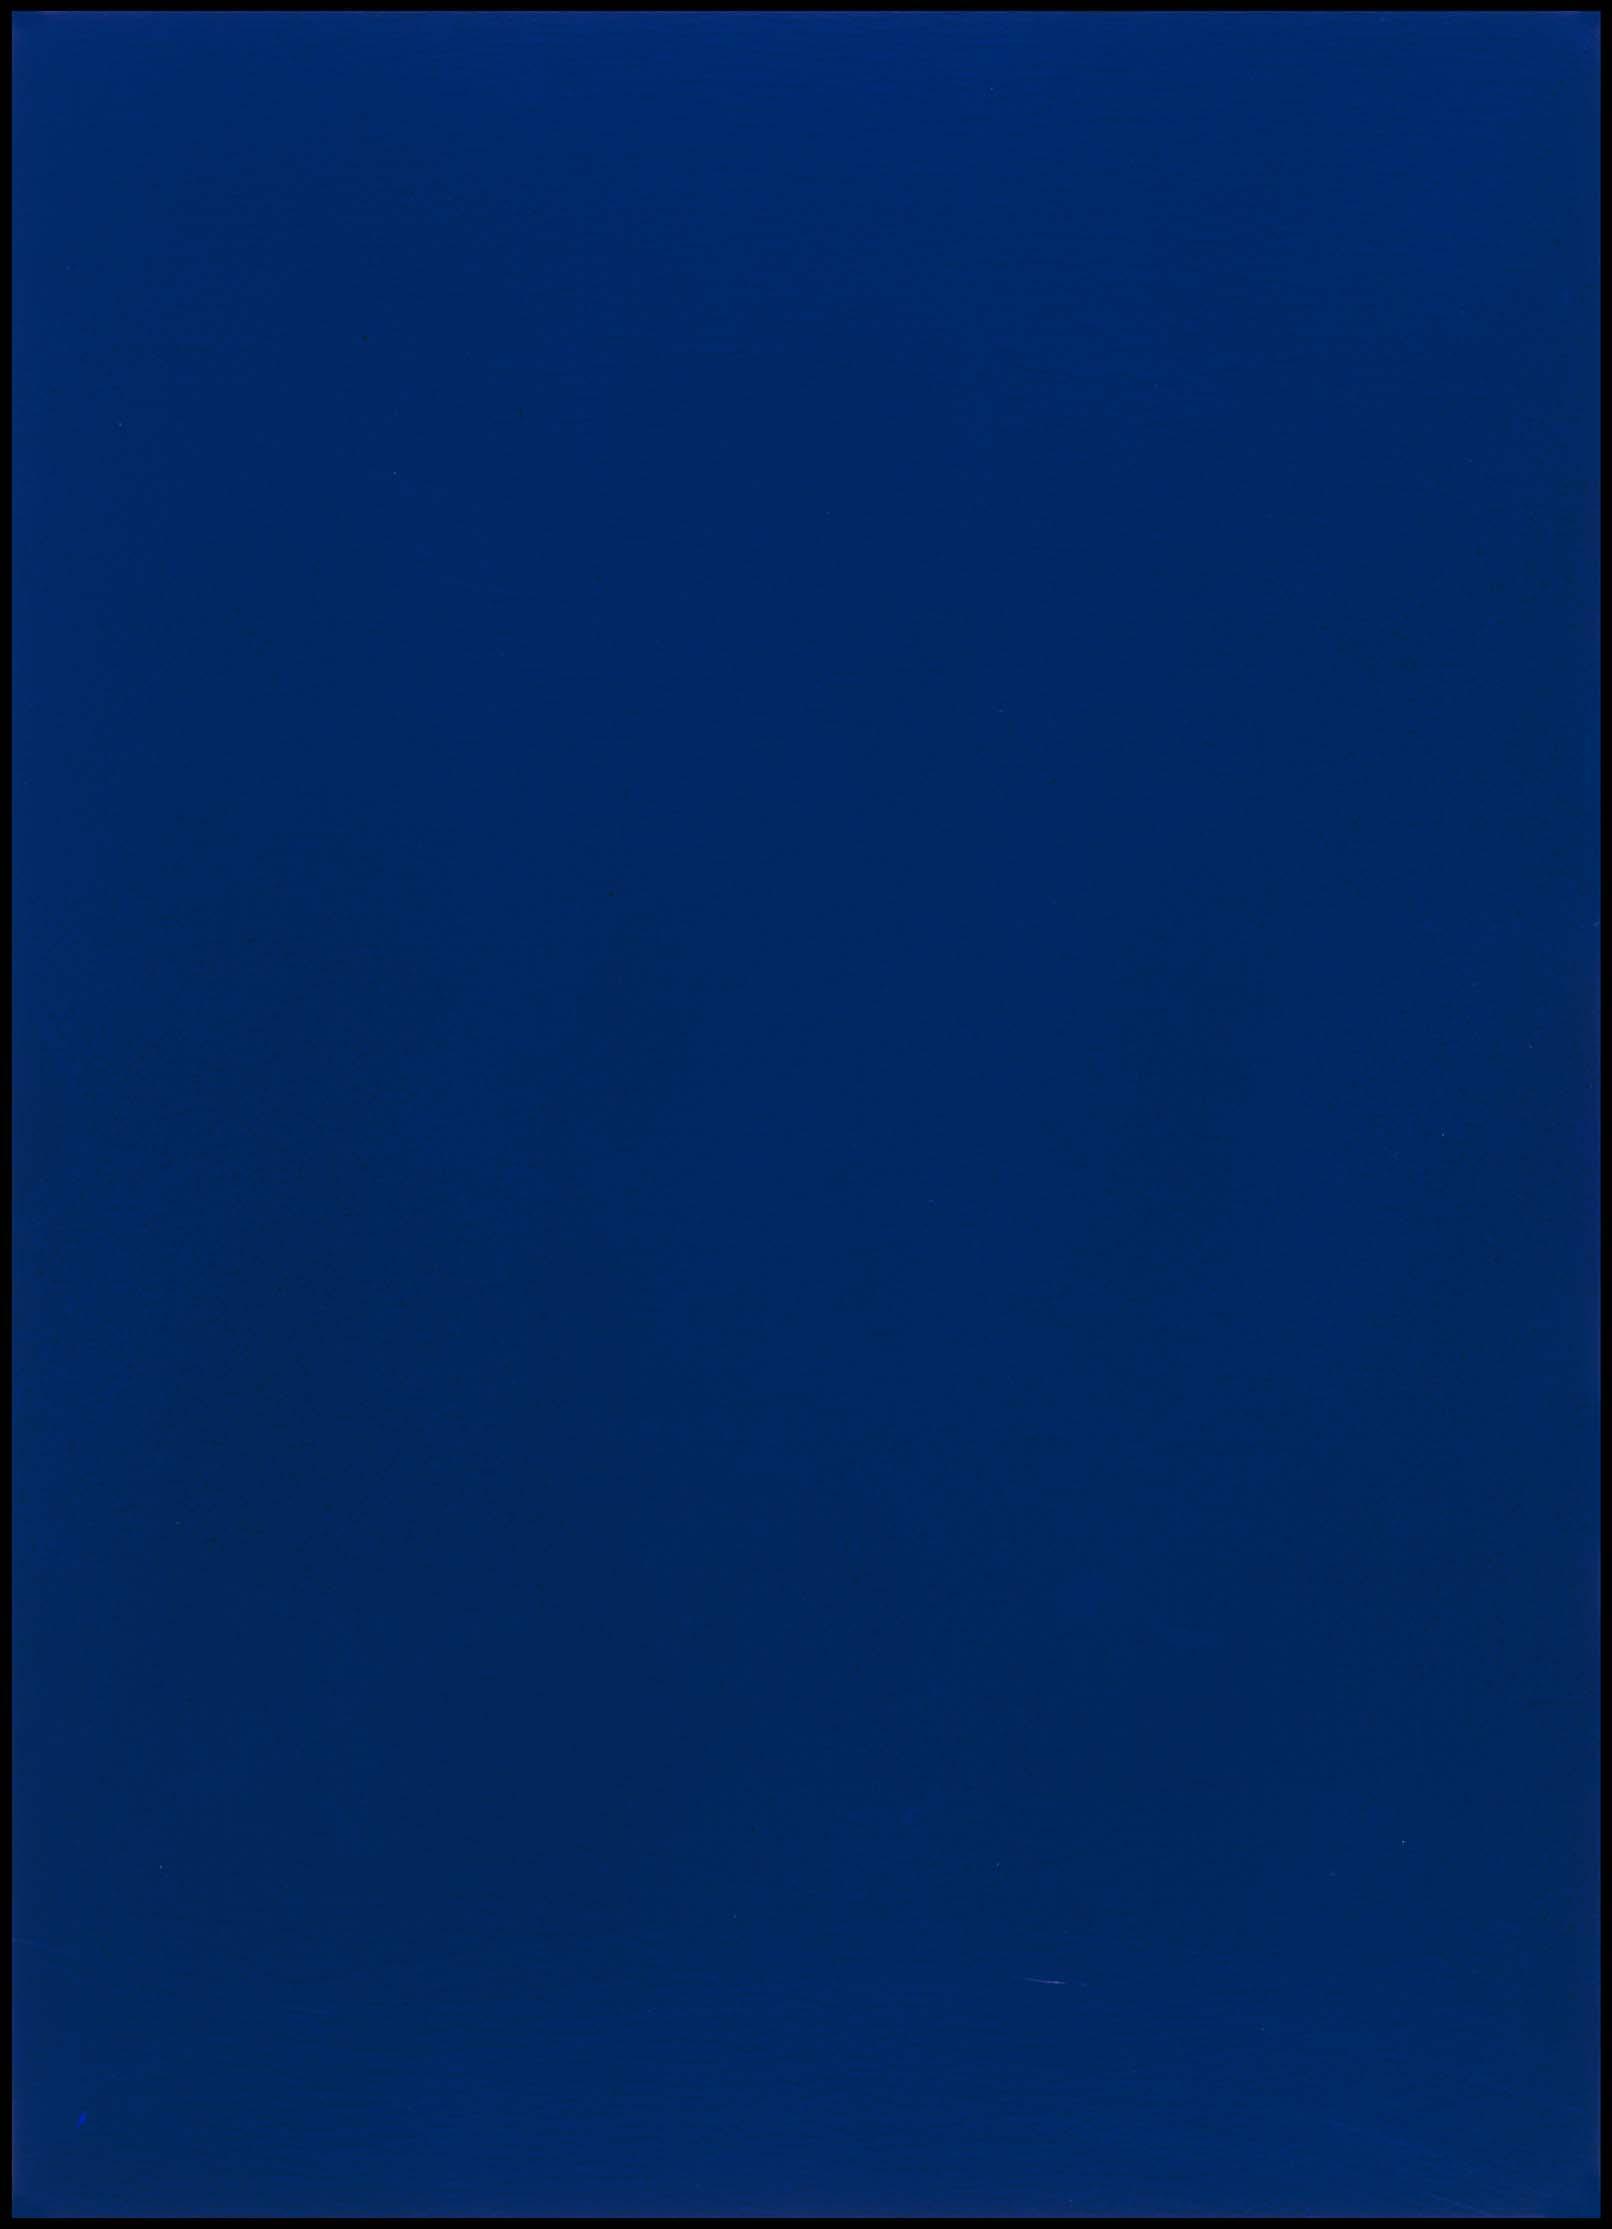 Home Entry Yves Klein Sin T 237 Tulo Monocromo Azul Ikb 181 Untitled